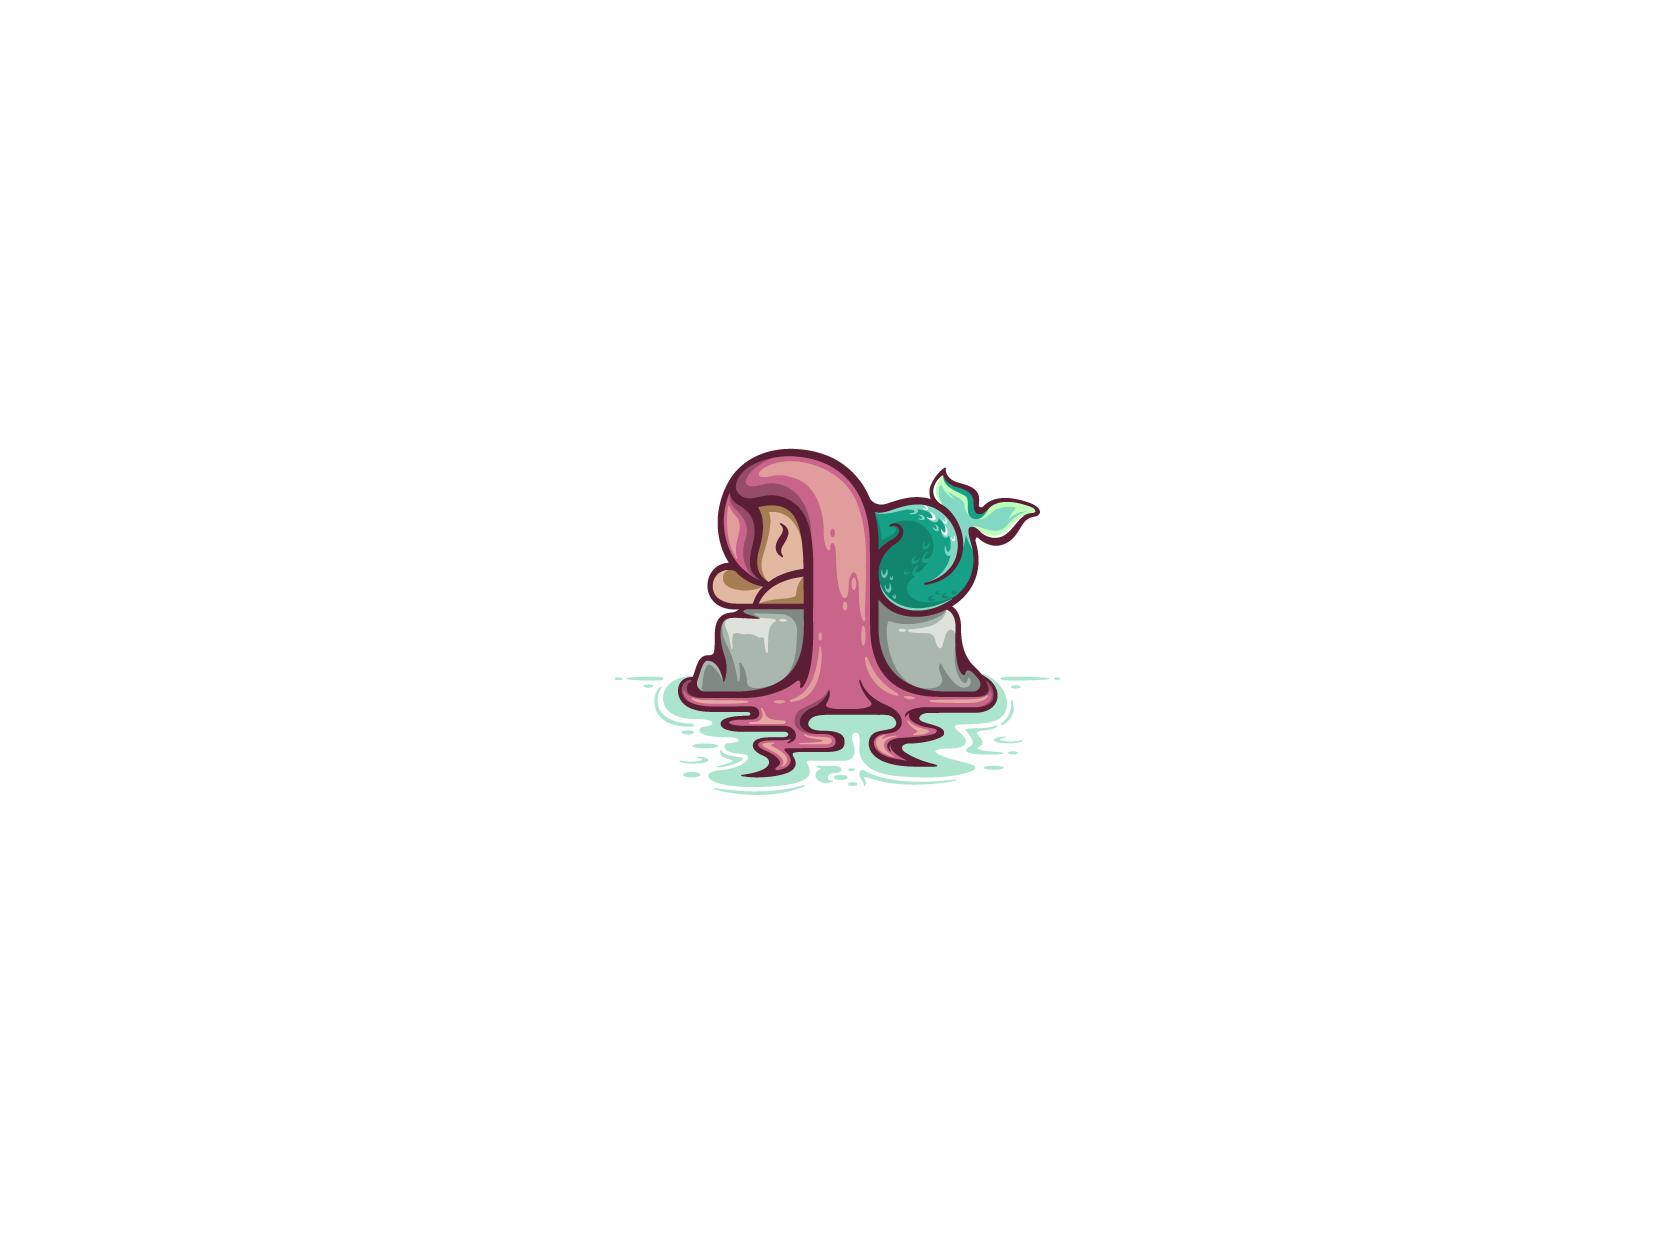 little mermaid sleeping on the rock character logo